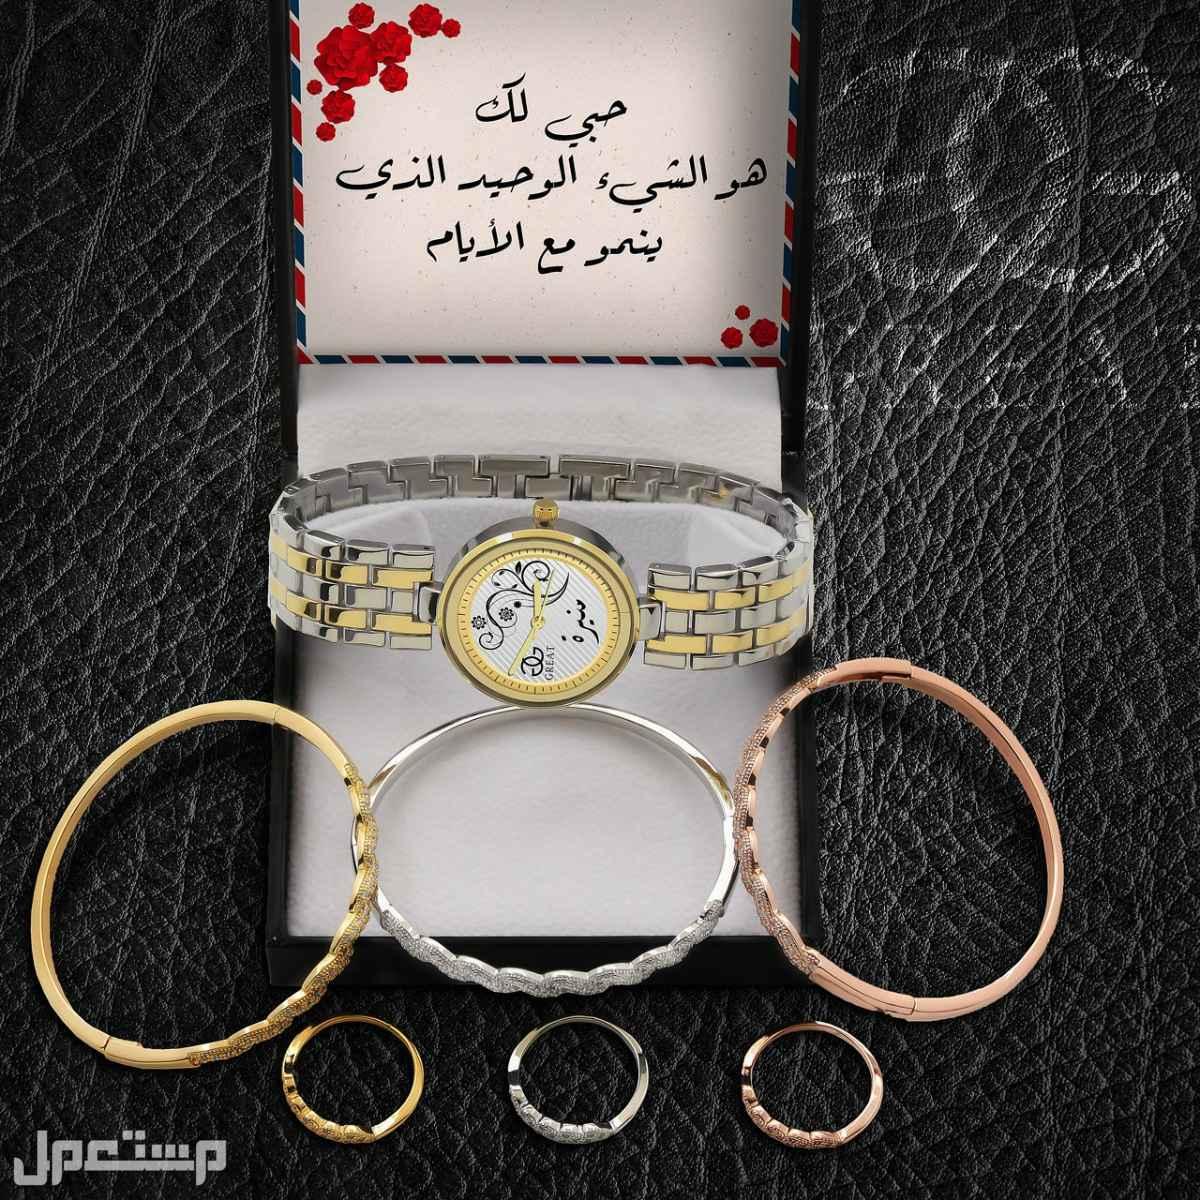 طقم نسائي فاخر # اهدي من تحب